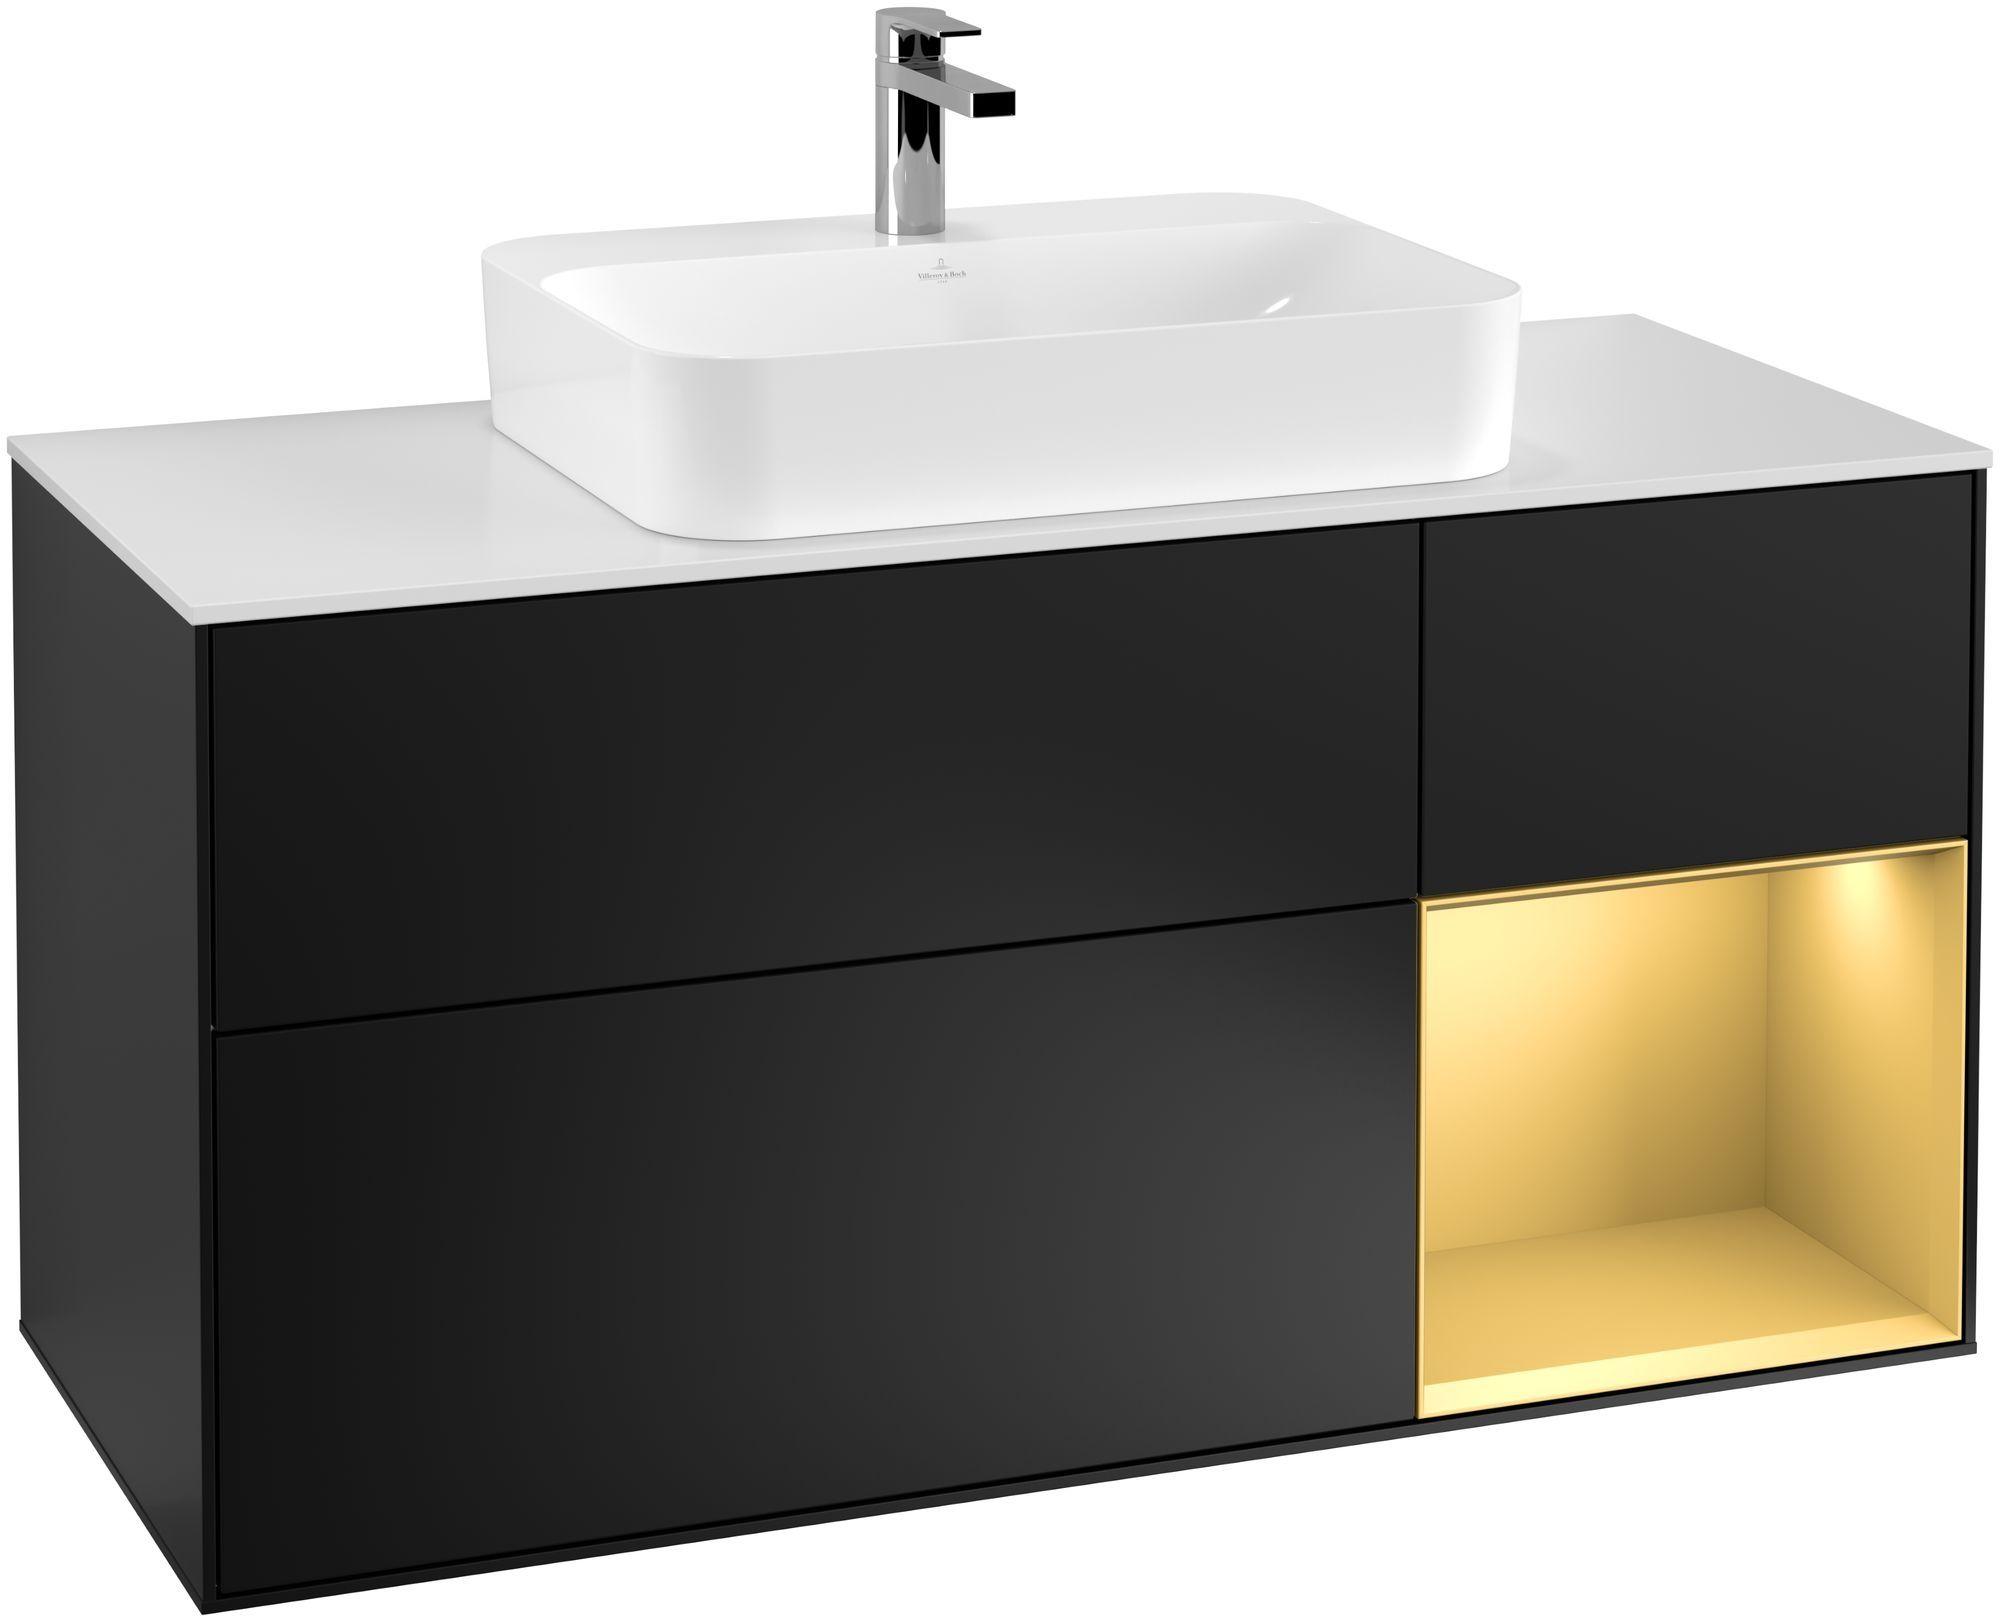 Villeroy & Boch Finion G42 Waschtischunterschrank mit Regalelement 3 Auszüge Waschtisch mittig LED-Beleuchtung B:120xH:60,3xT:50,1cm Front, Korpus: Black Matt Lacquer, Regal: Gold Matt, Glasplatte: White Matt G421HFPD